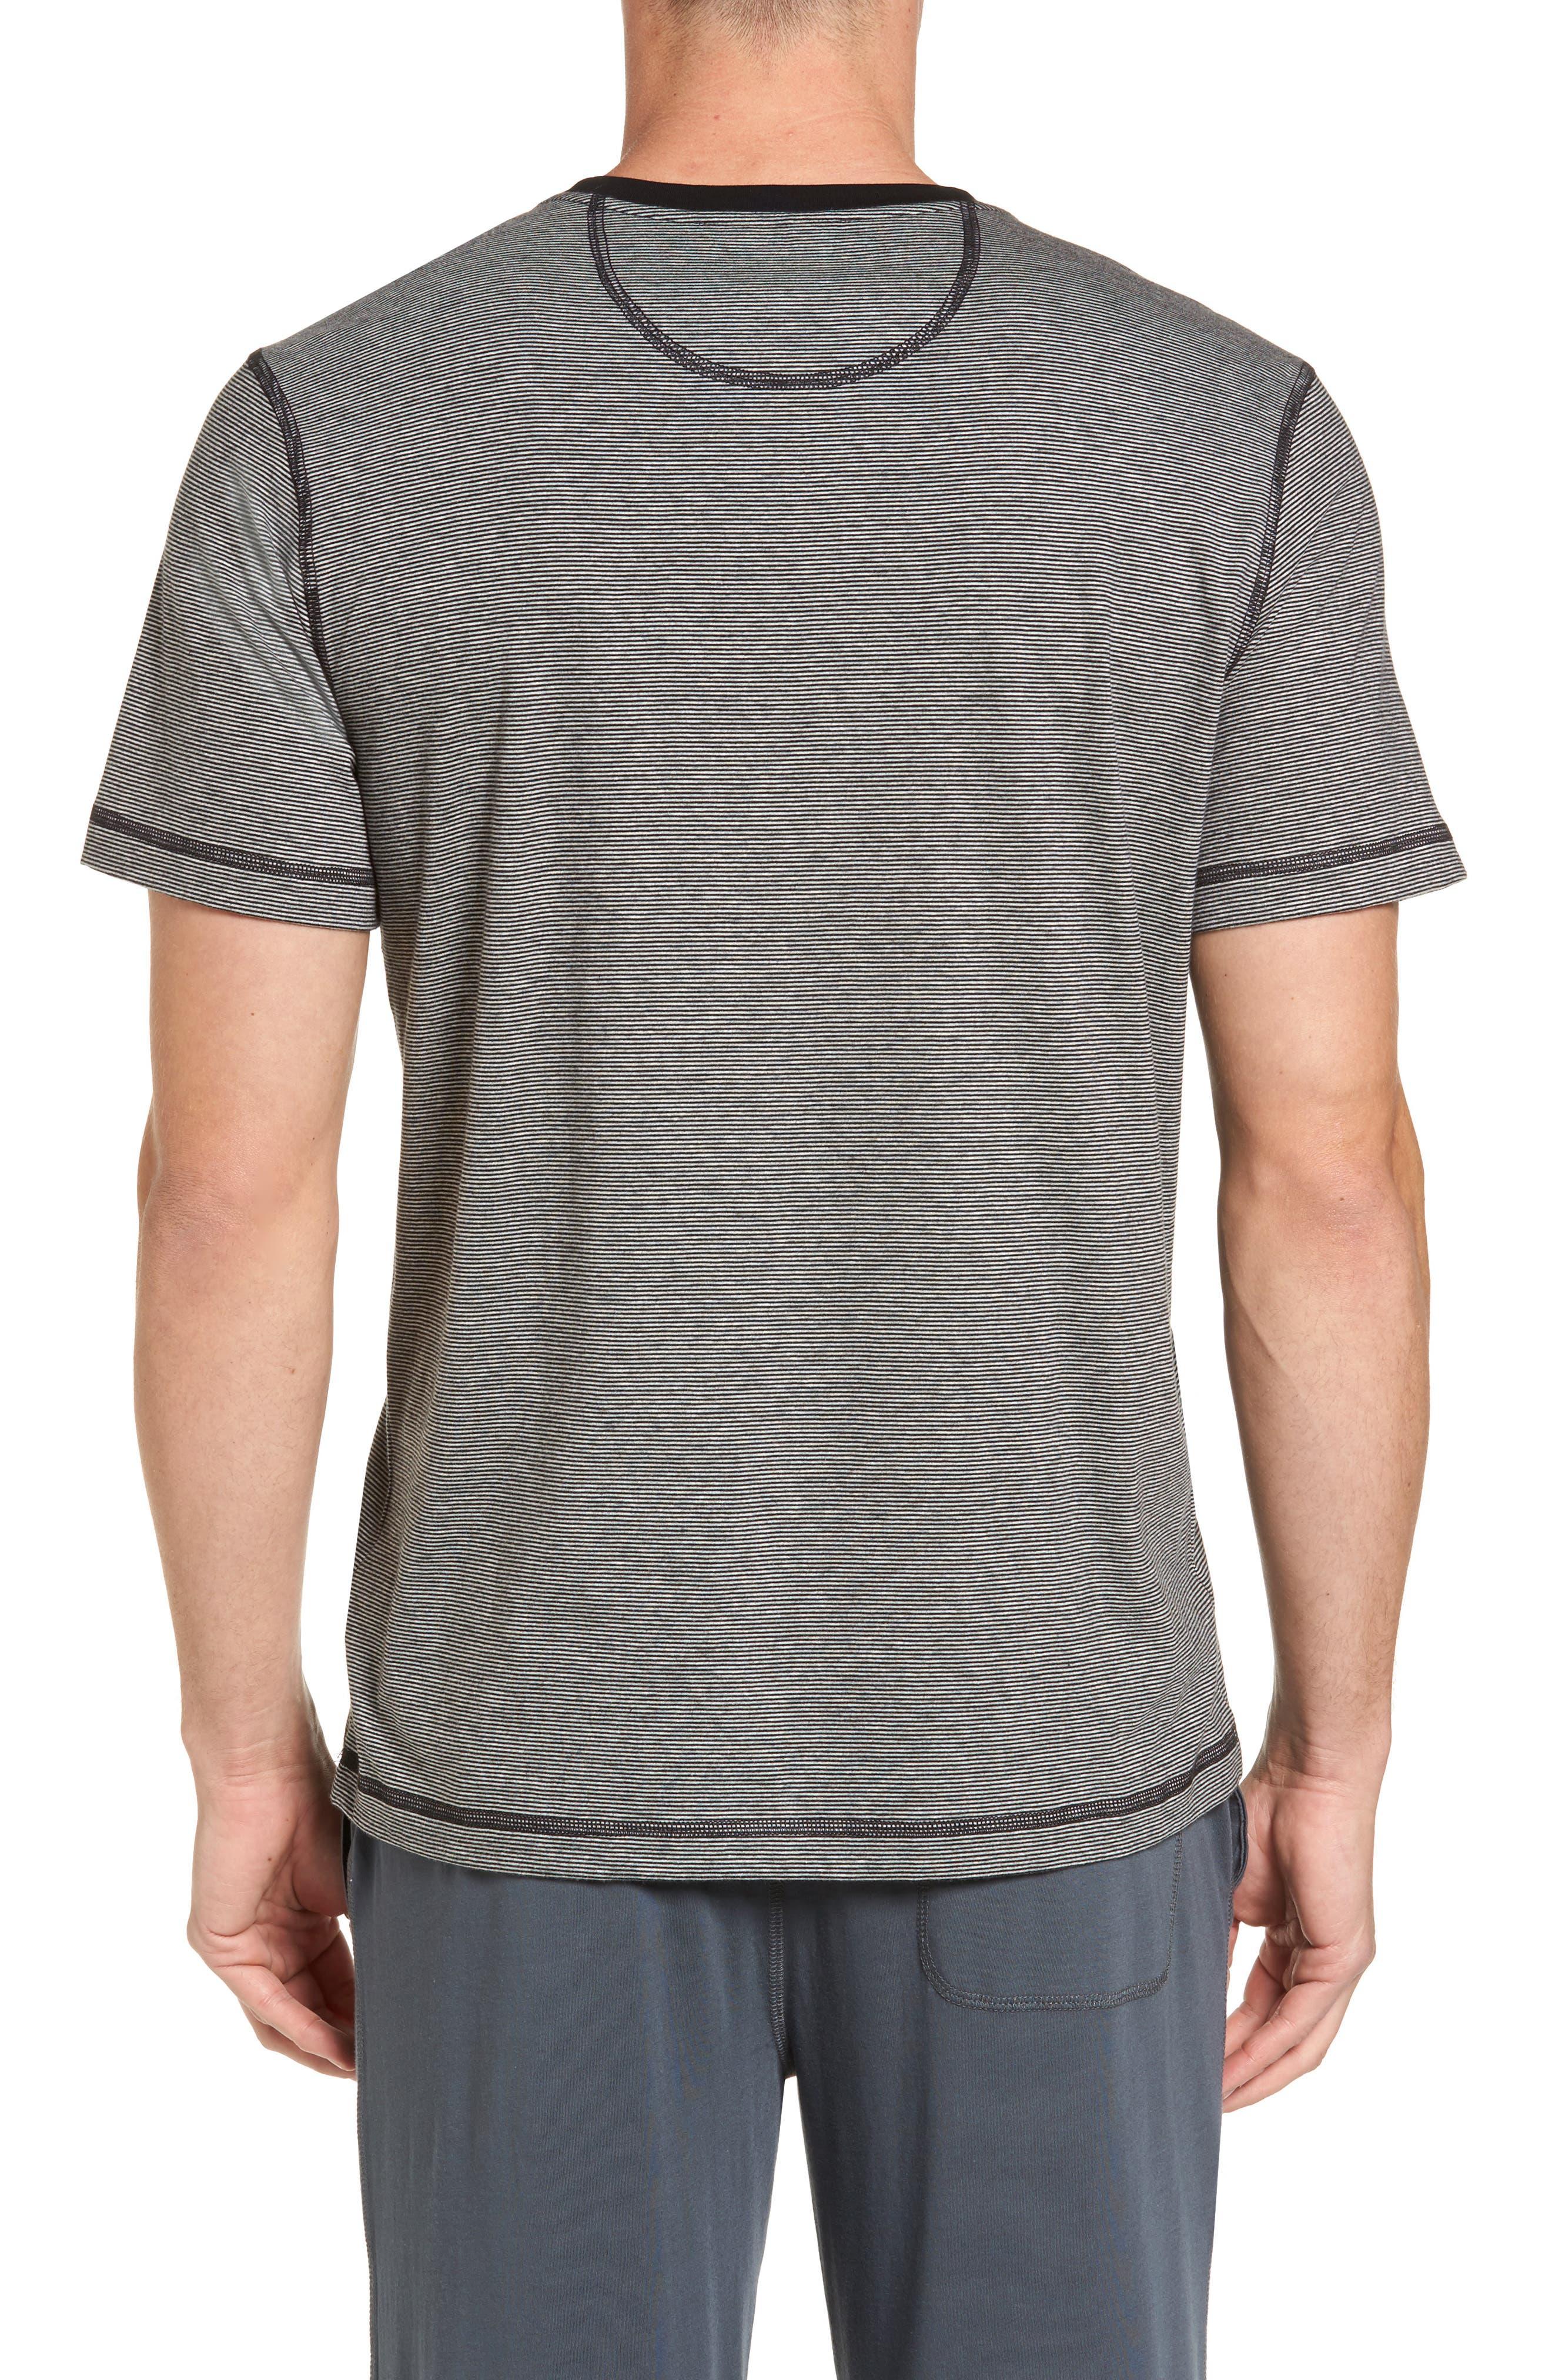 Peruvian Pima Cotton T-Shirt,                             Alternate thumbnail 2, color,                             Black/ Grey Heather